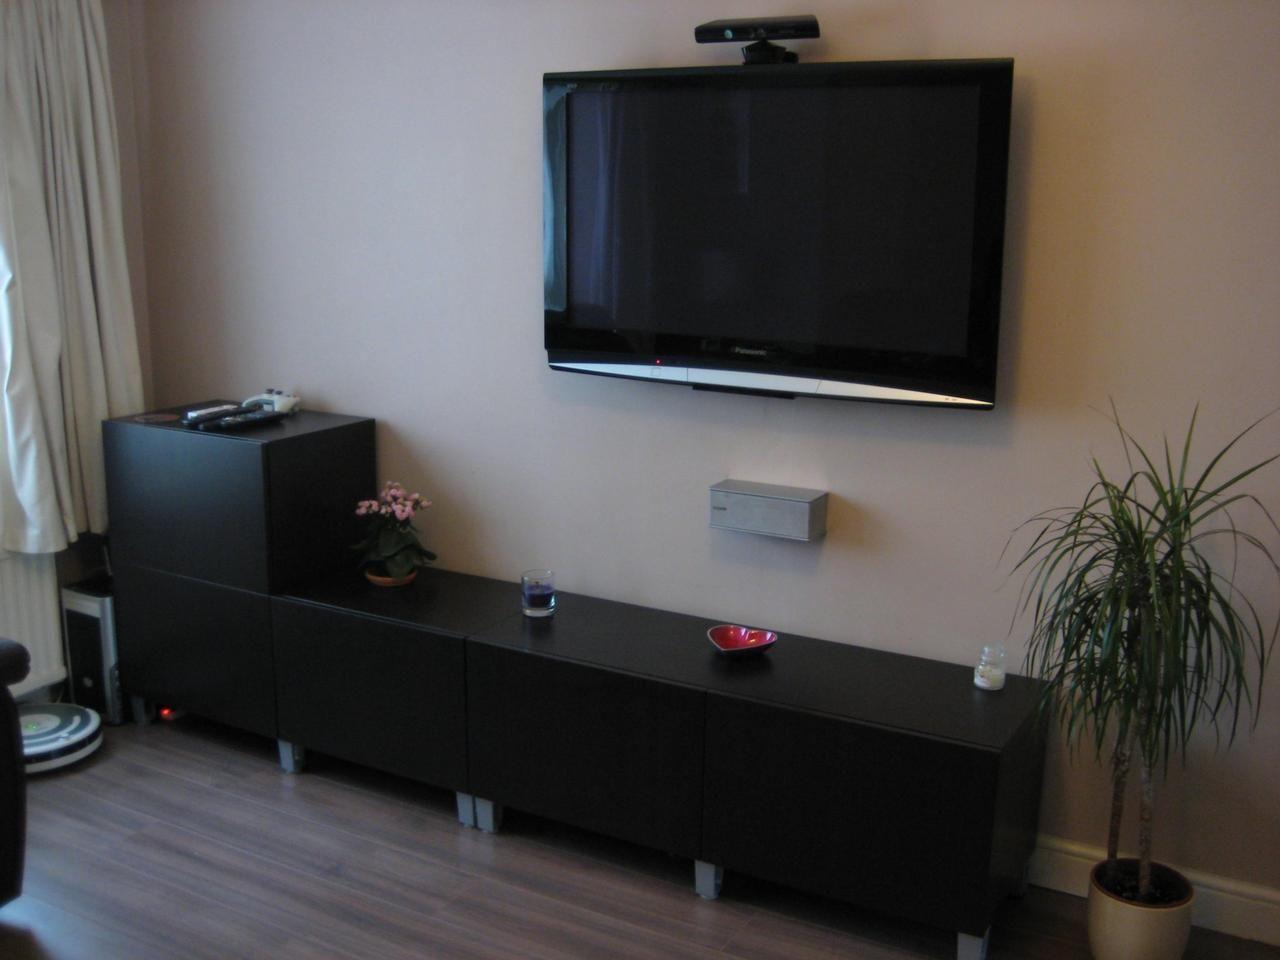 http://www.bebarang/more-fun-with-wall-mounts-for-tv/ more fun